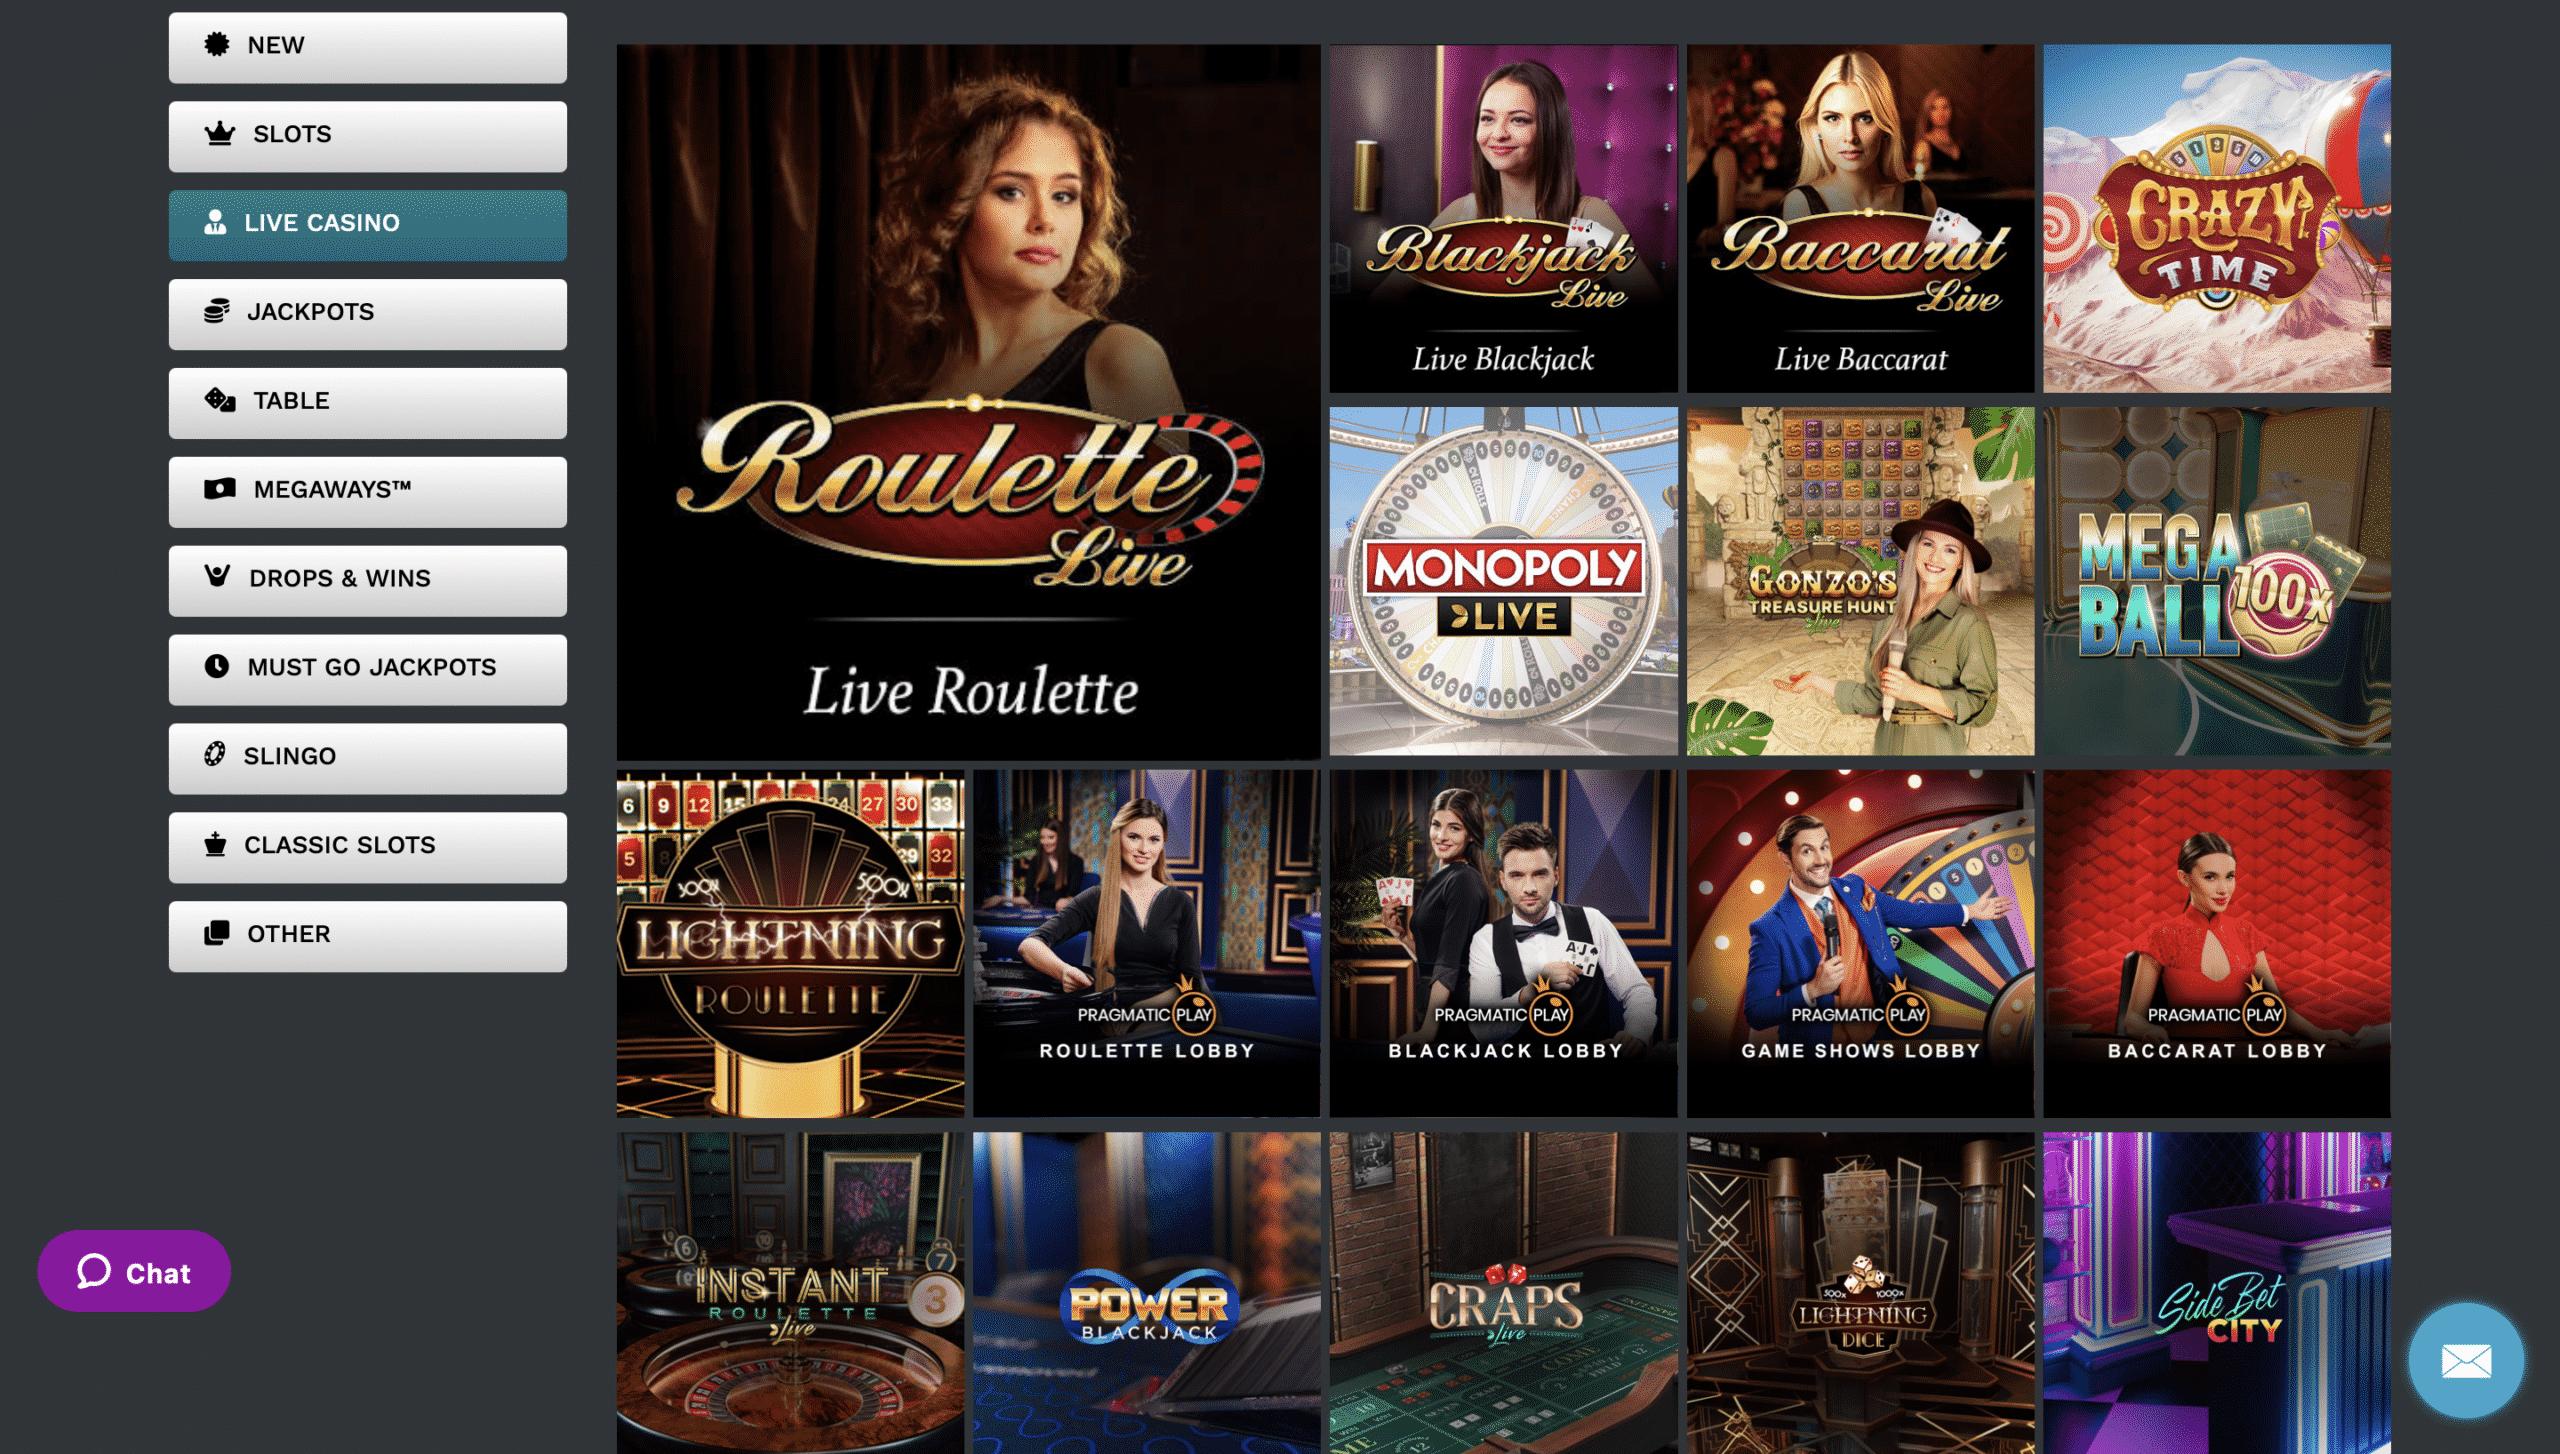 21Prive Casino Live Casino